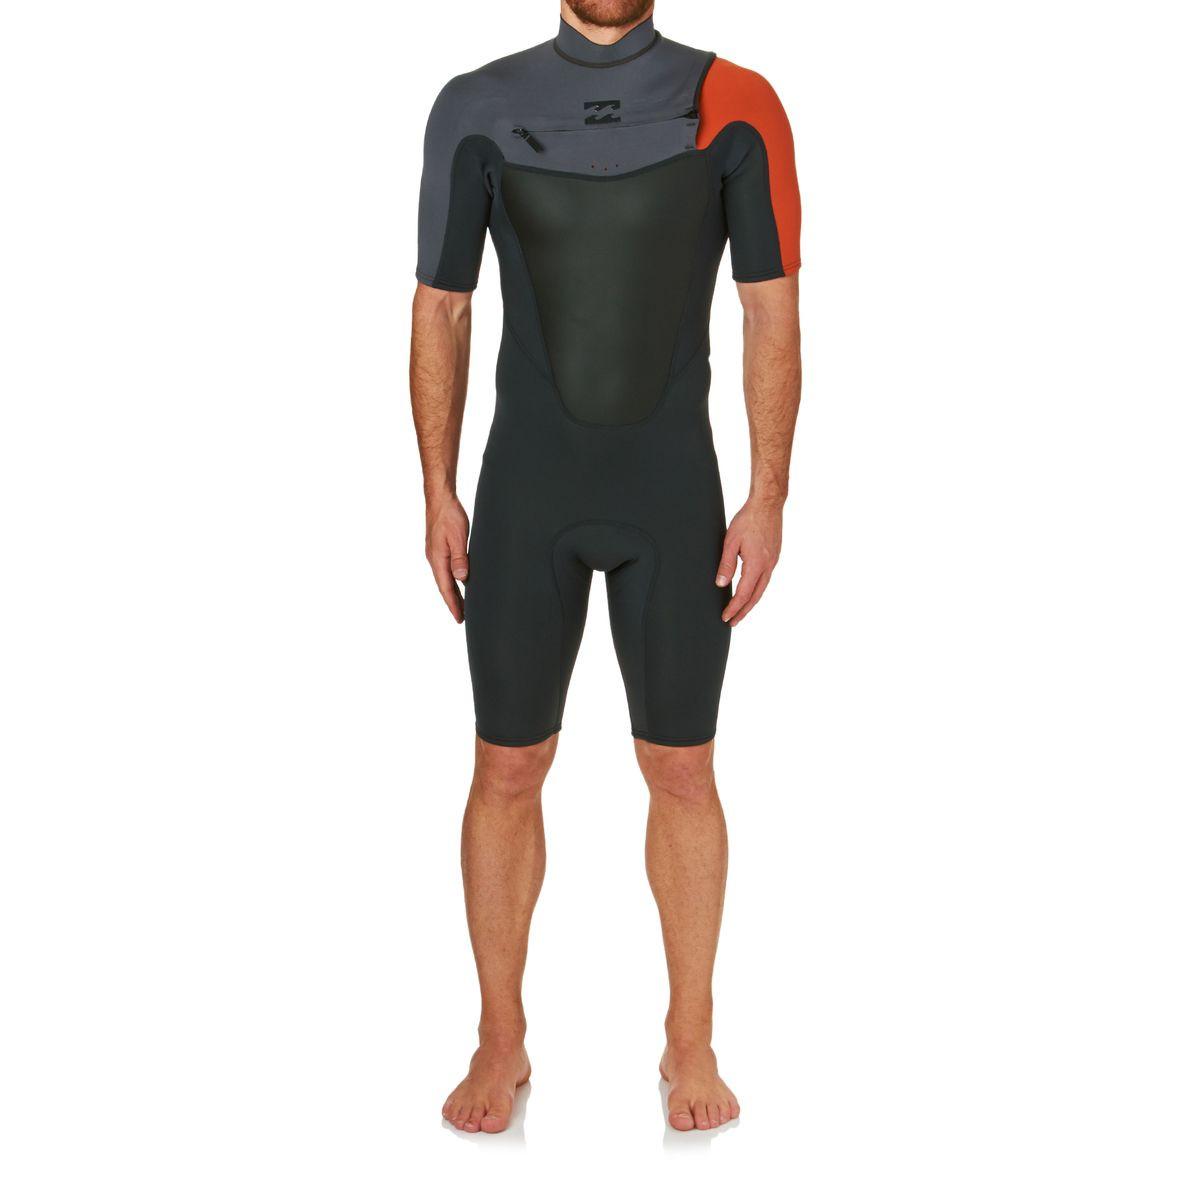 Billabong Absolute Comp 2mm 2017 Chest Zip Short Sleeve Shorty Wetsuit - Orange